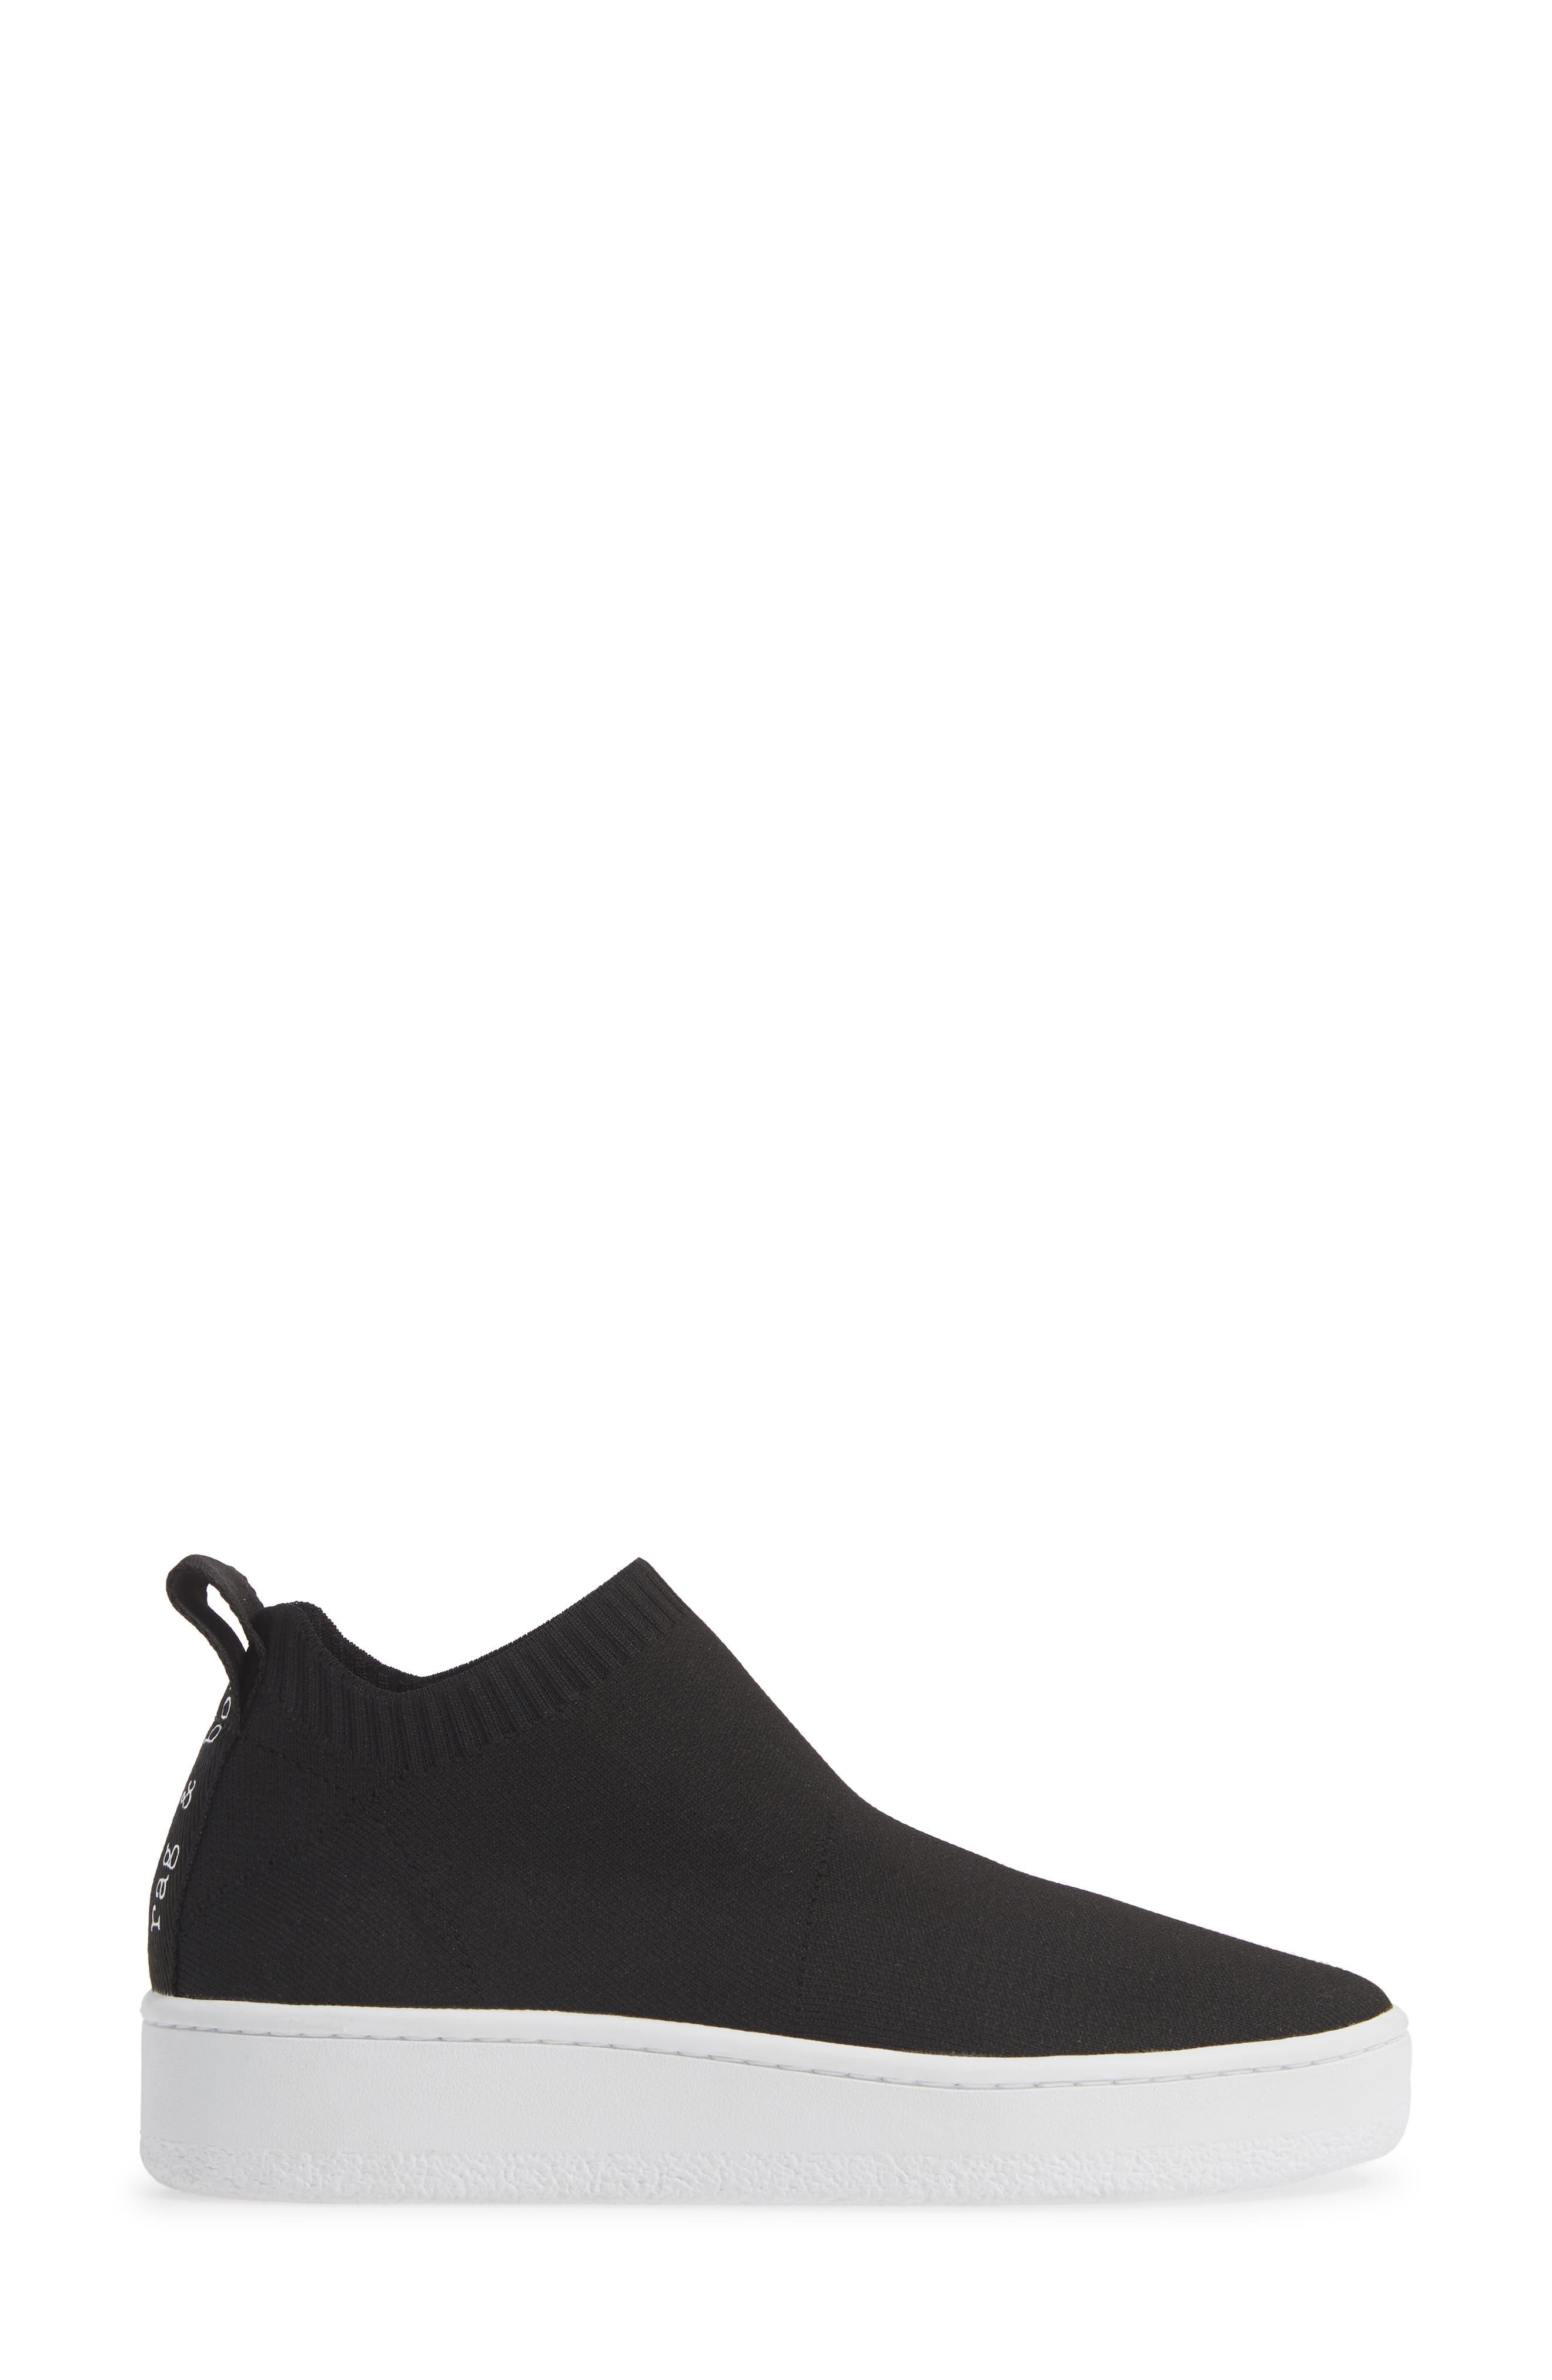 Orion Platform Sneaker,                             Alternate thumbnail 3, color,                             001